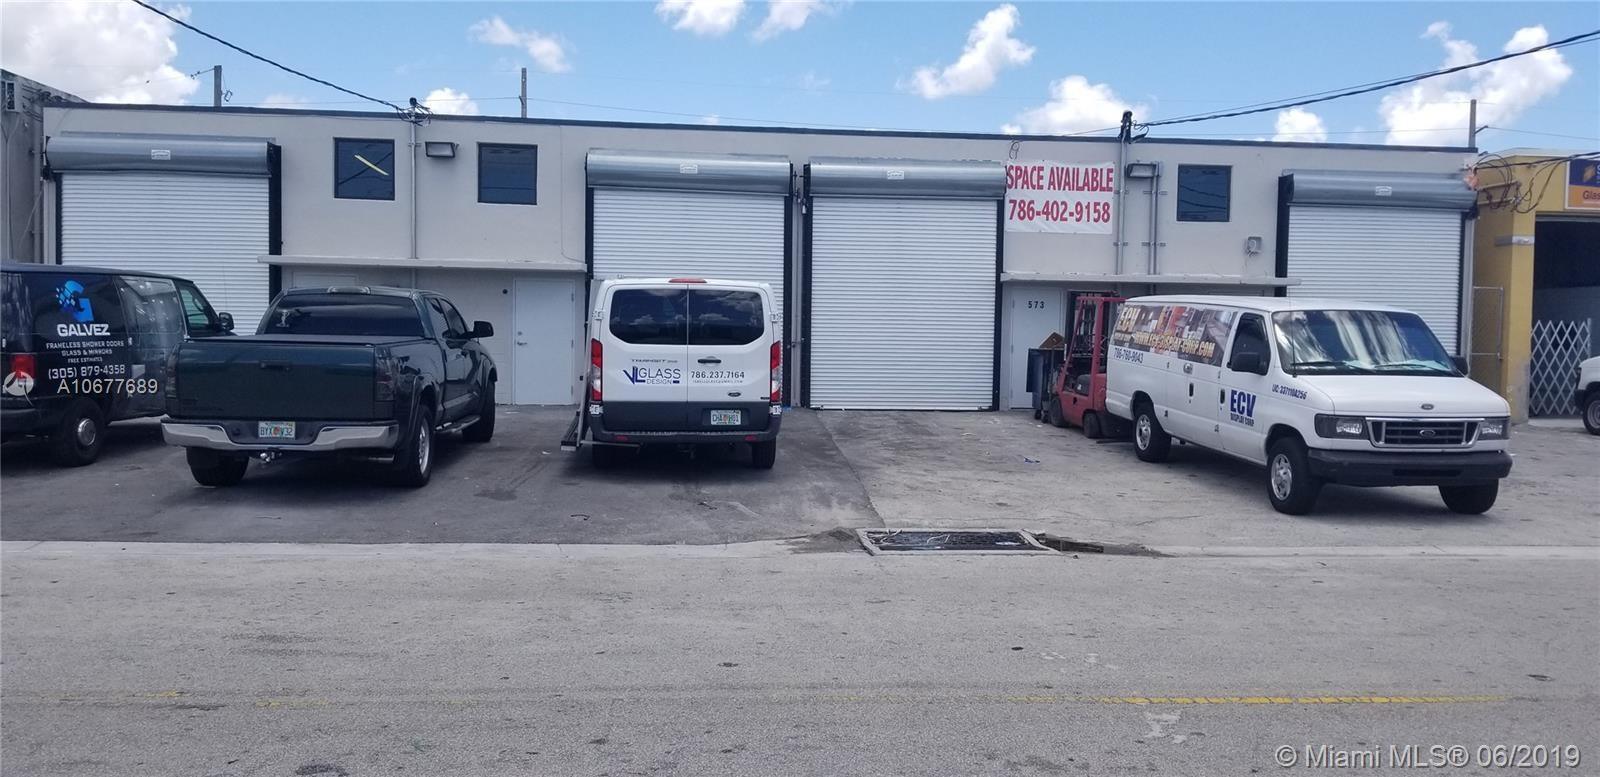 571 W 28th St, Hialeah, FL 33010